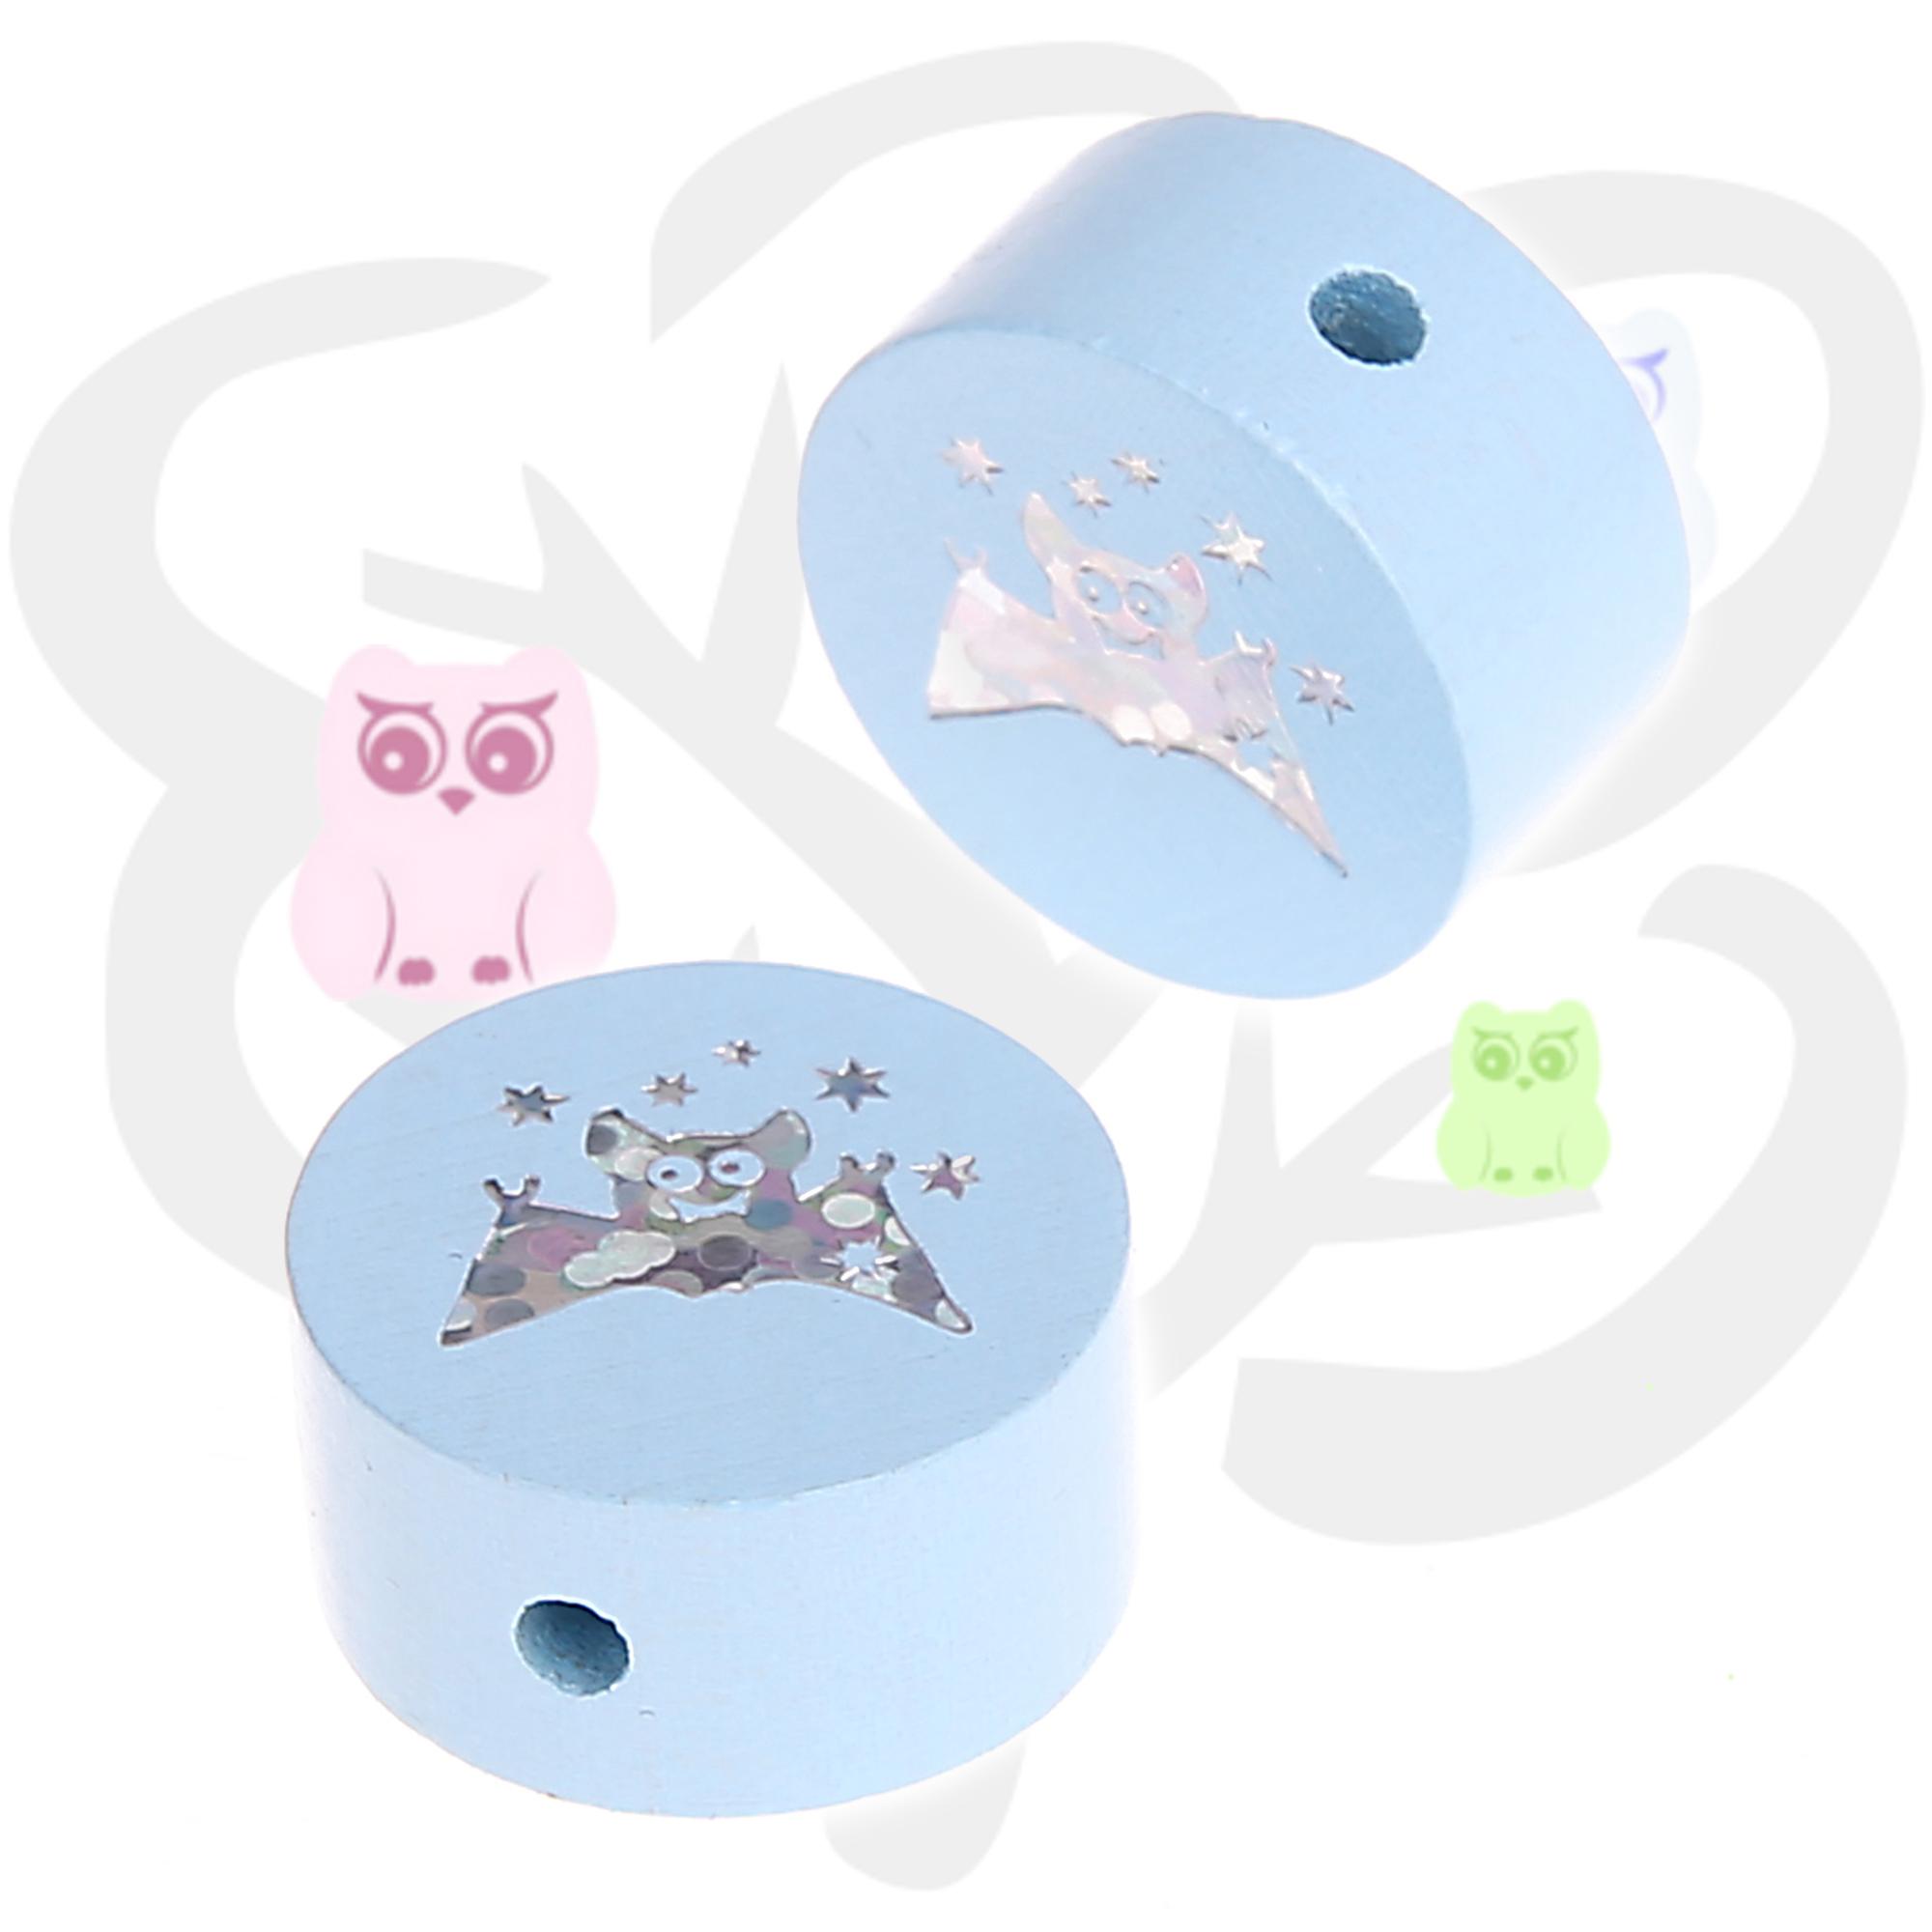 motivperle fledermaus flederm use motivperlen schnullerkette schnullerketten. Black Bedroom Furniture Sets. Home Design Ideas